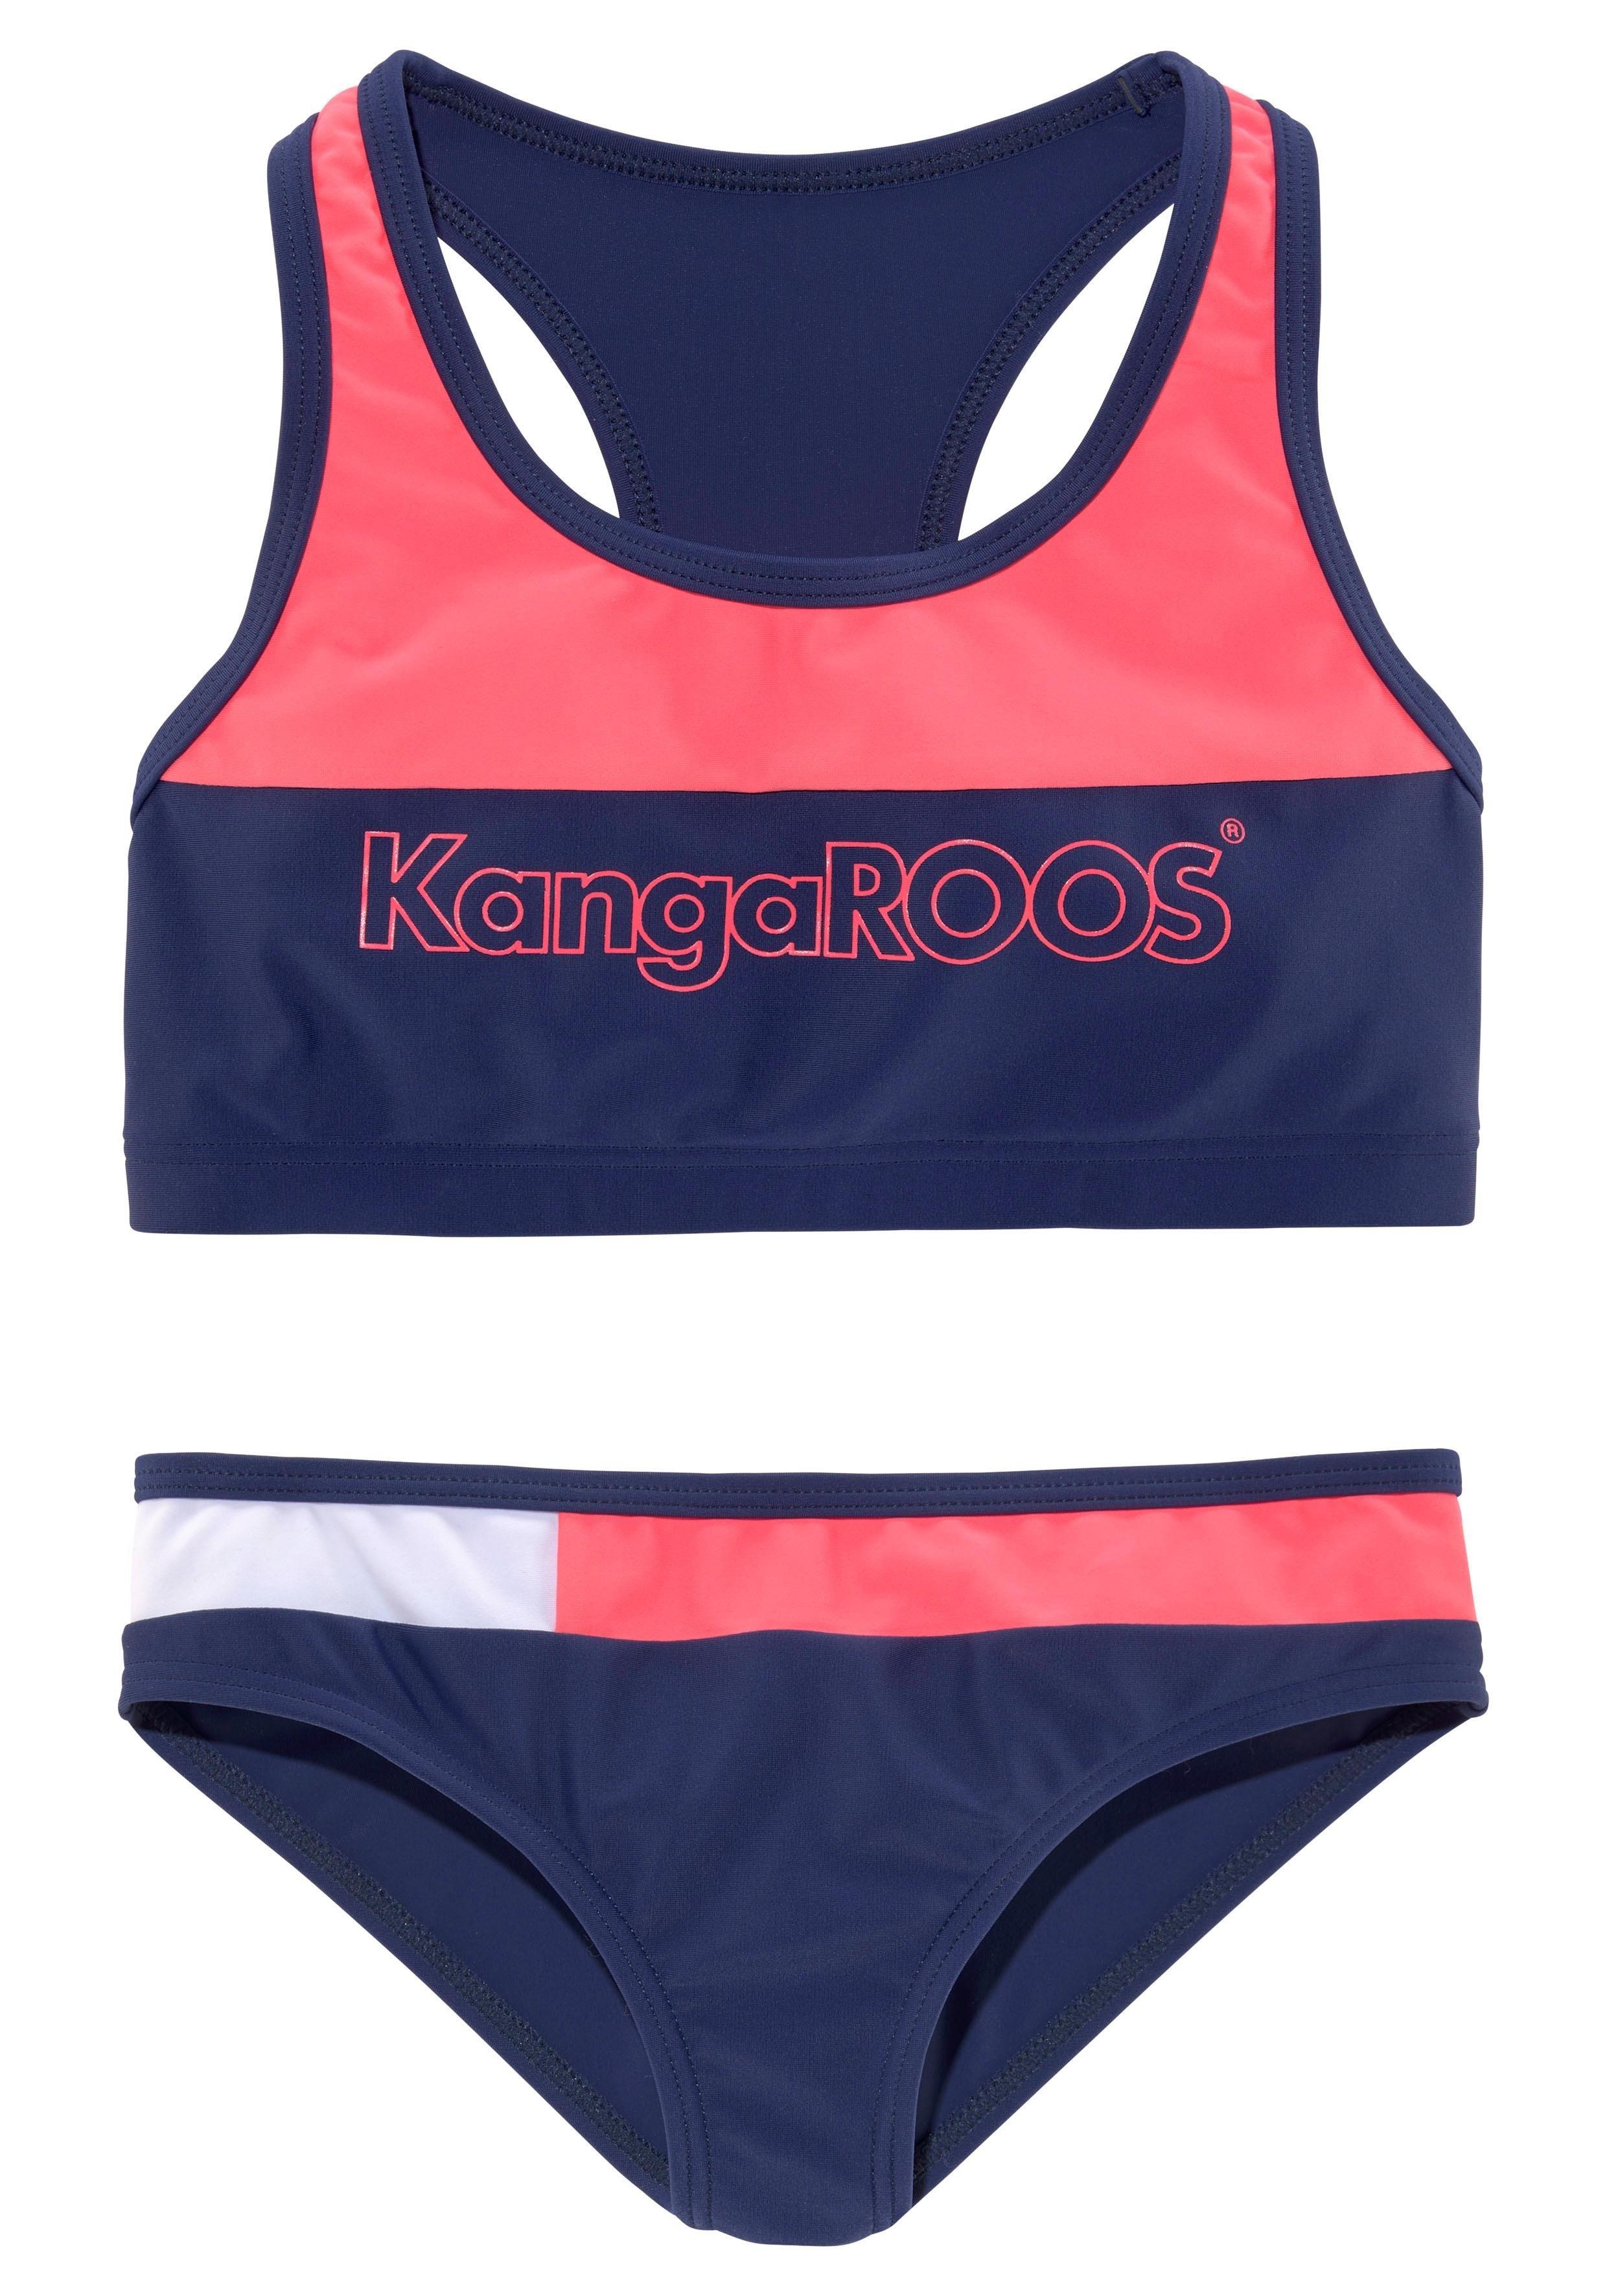 KangaROOS bustierbikini bij Lascana online kopen